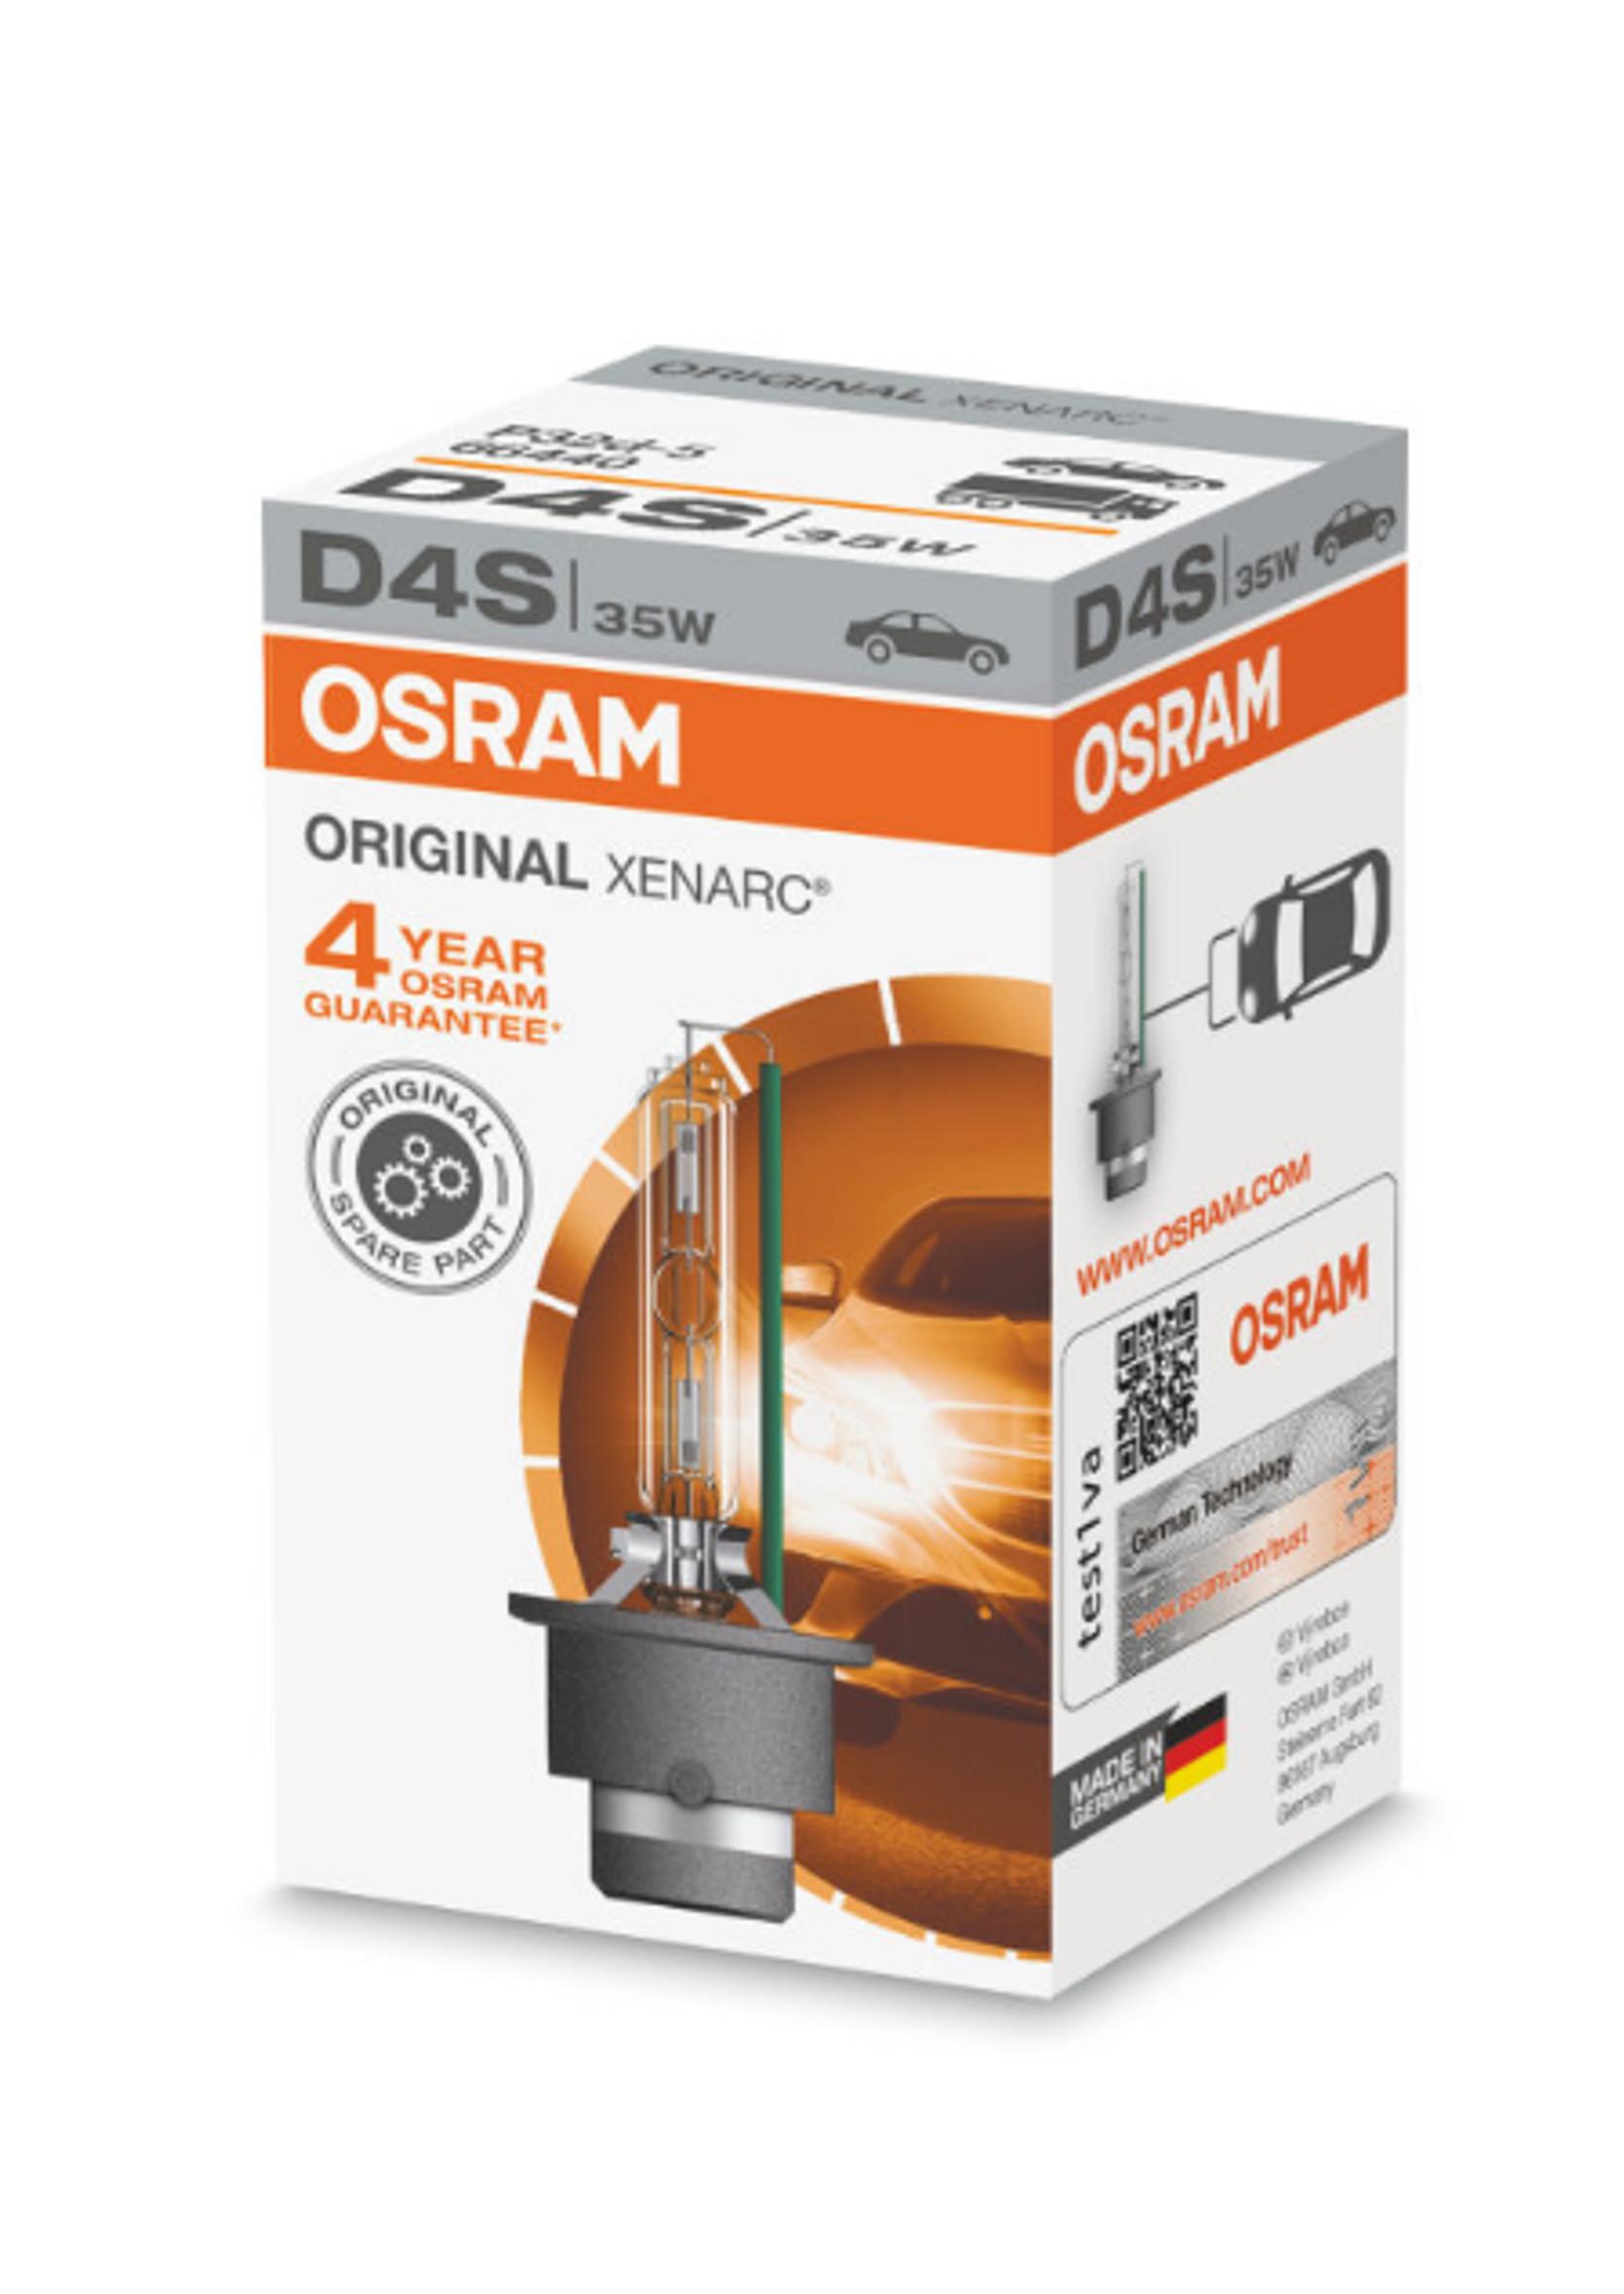 Osram Xenarc Original D4S 42V 35W Żarnik 1szt